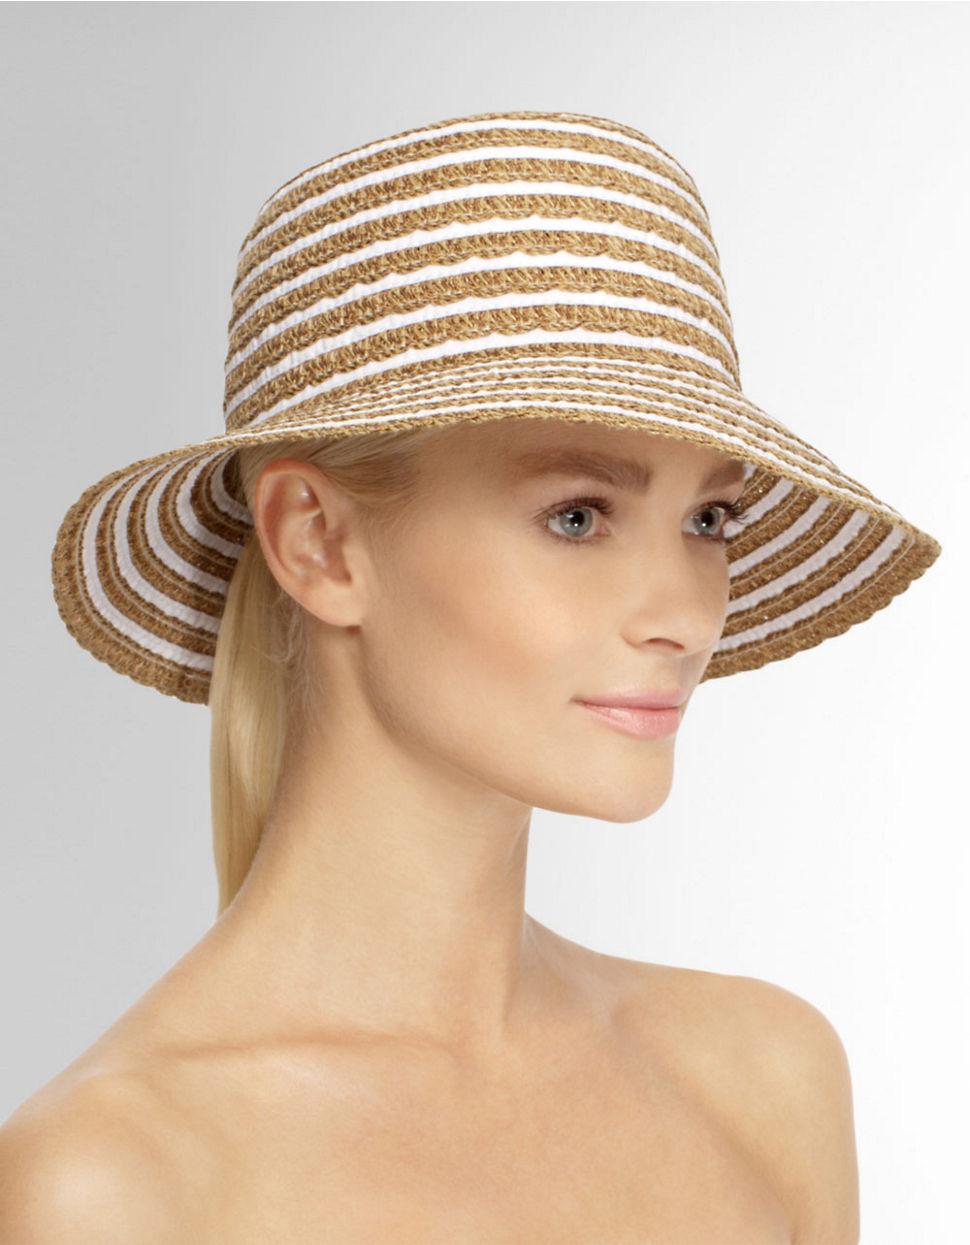 Lyst eric javits braid dame bucket hat in white jpg 970x1245 Eric javits  dame cap 8e37a18dac8